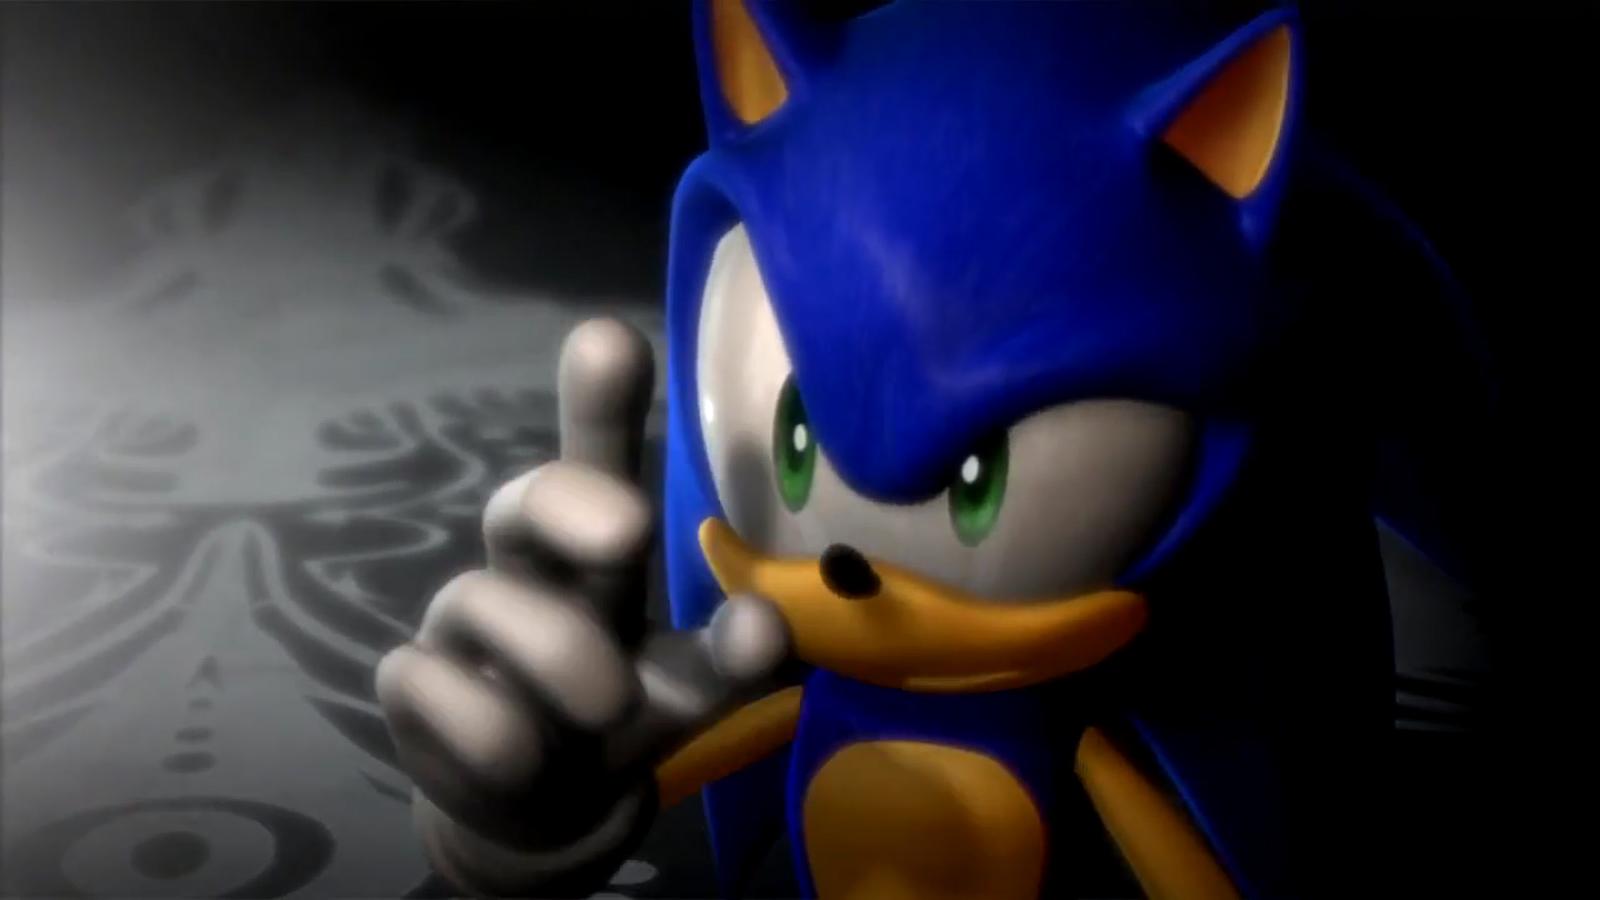 Sonic The Hedgehog 2006 By Hinata70756 On Deviantart